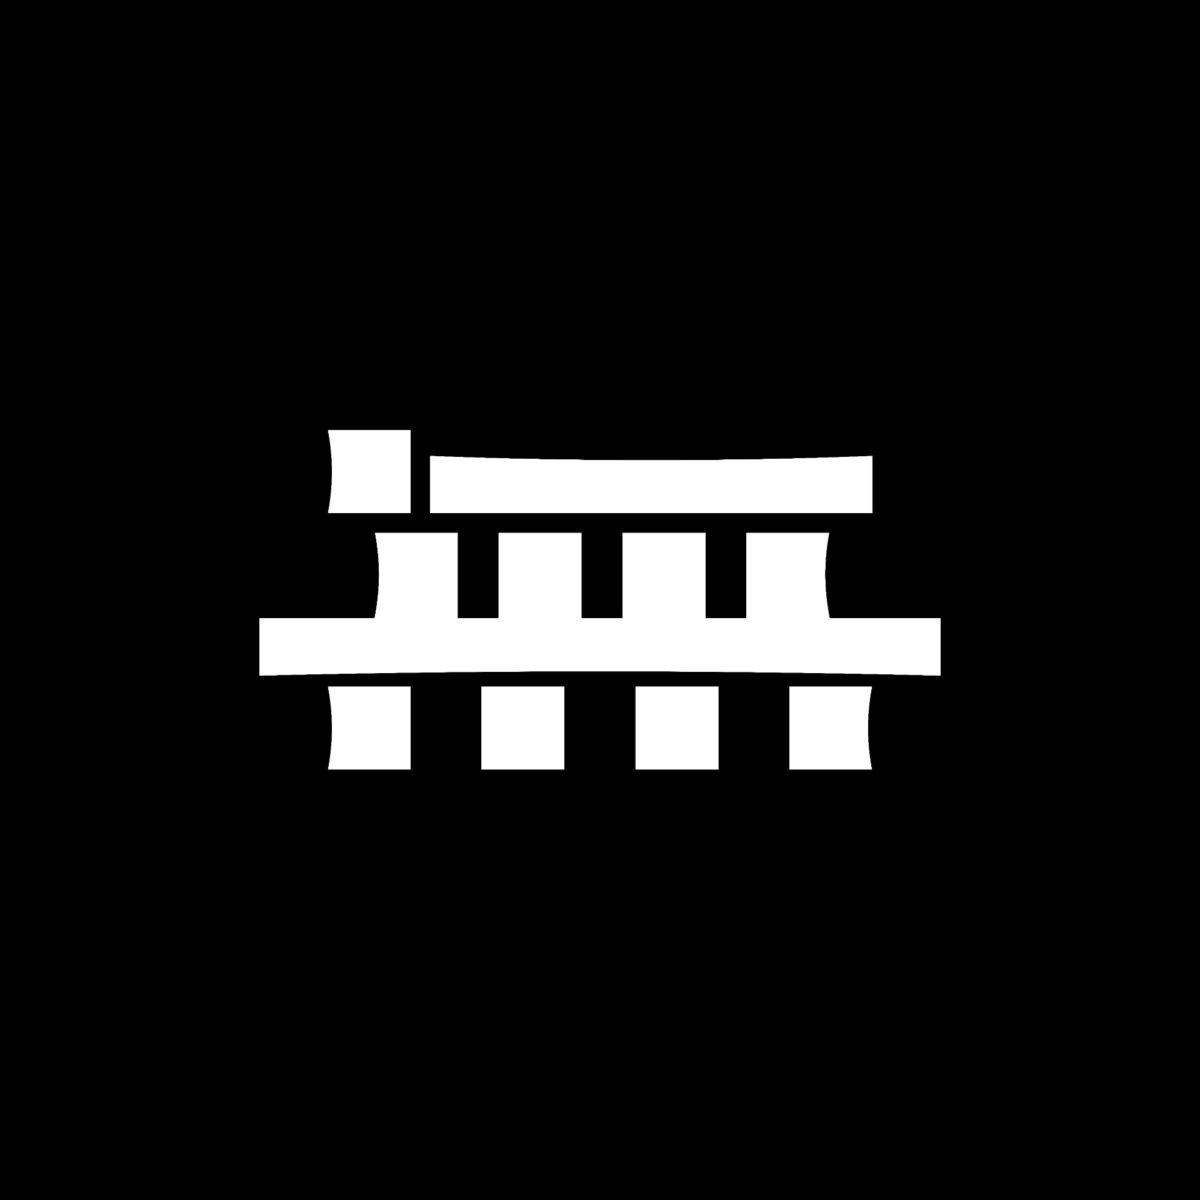 古民家・秘境・絶景の検索サイト